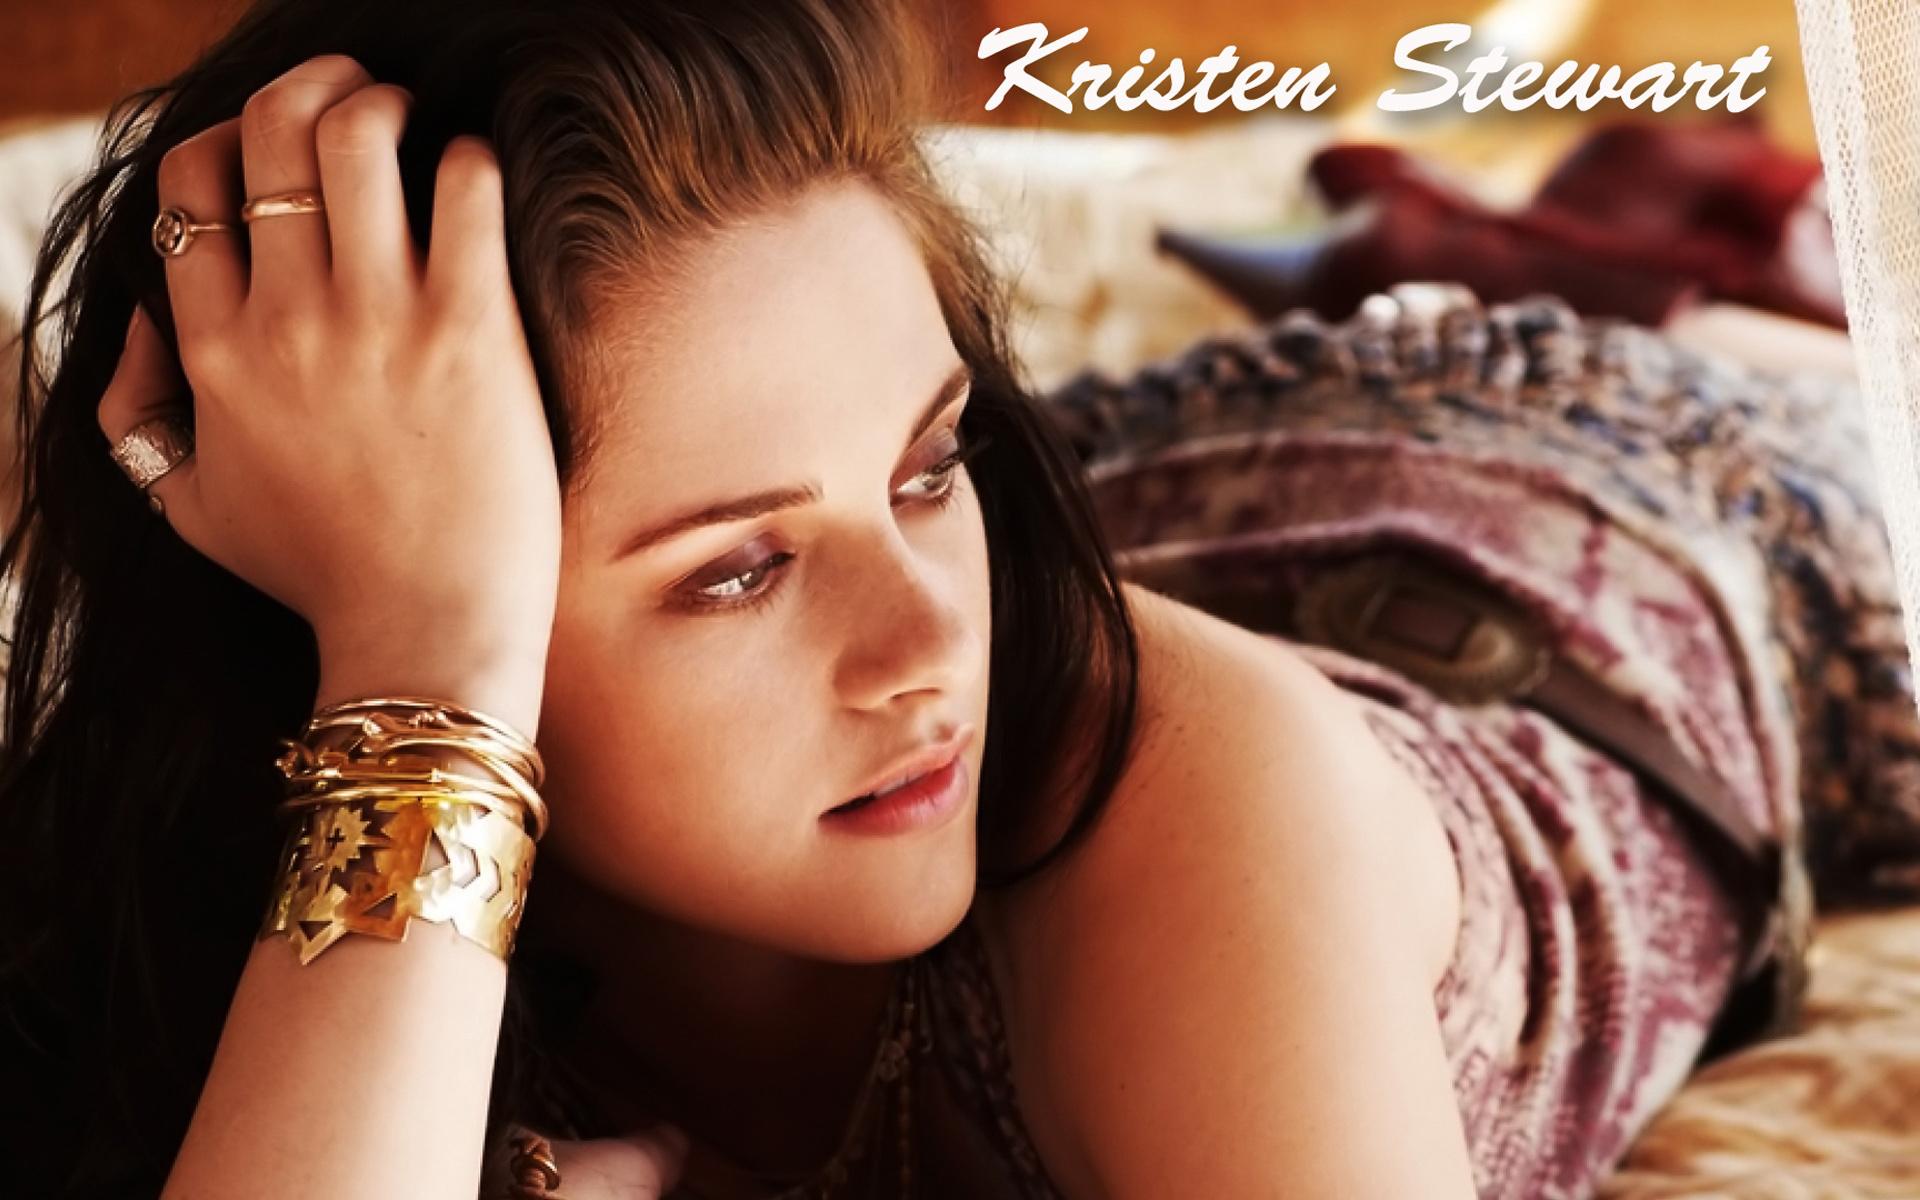 Kristen Stewart 37 wallpaper